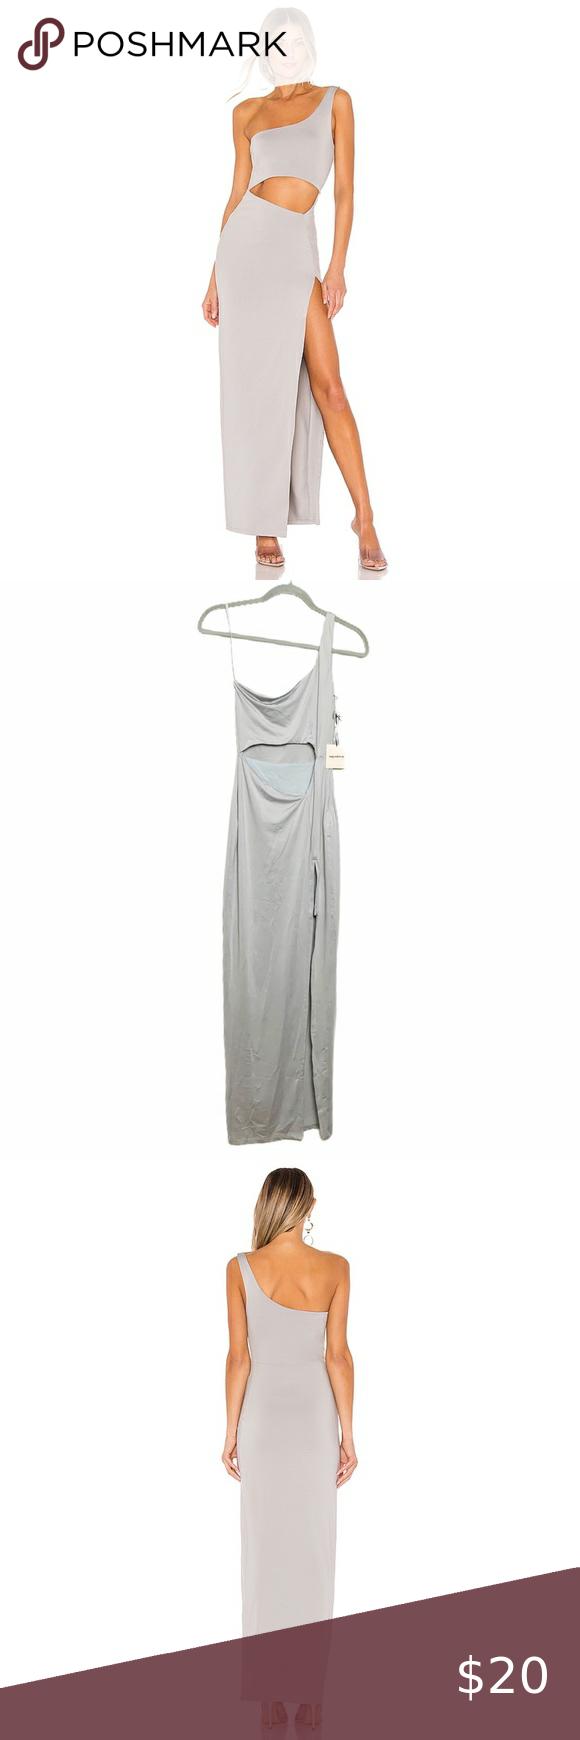 Superdown Erla Cutout Maxi Dress Light Gray Xs Cutout Maxi Dress Gorgeous Maxi Dresses Maxi Dress [ 1740 x 580 Pixel ]